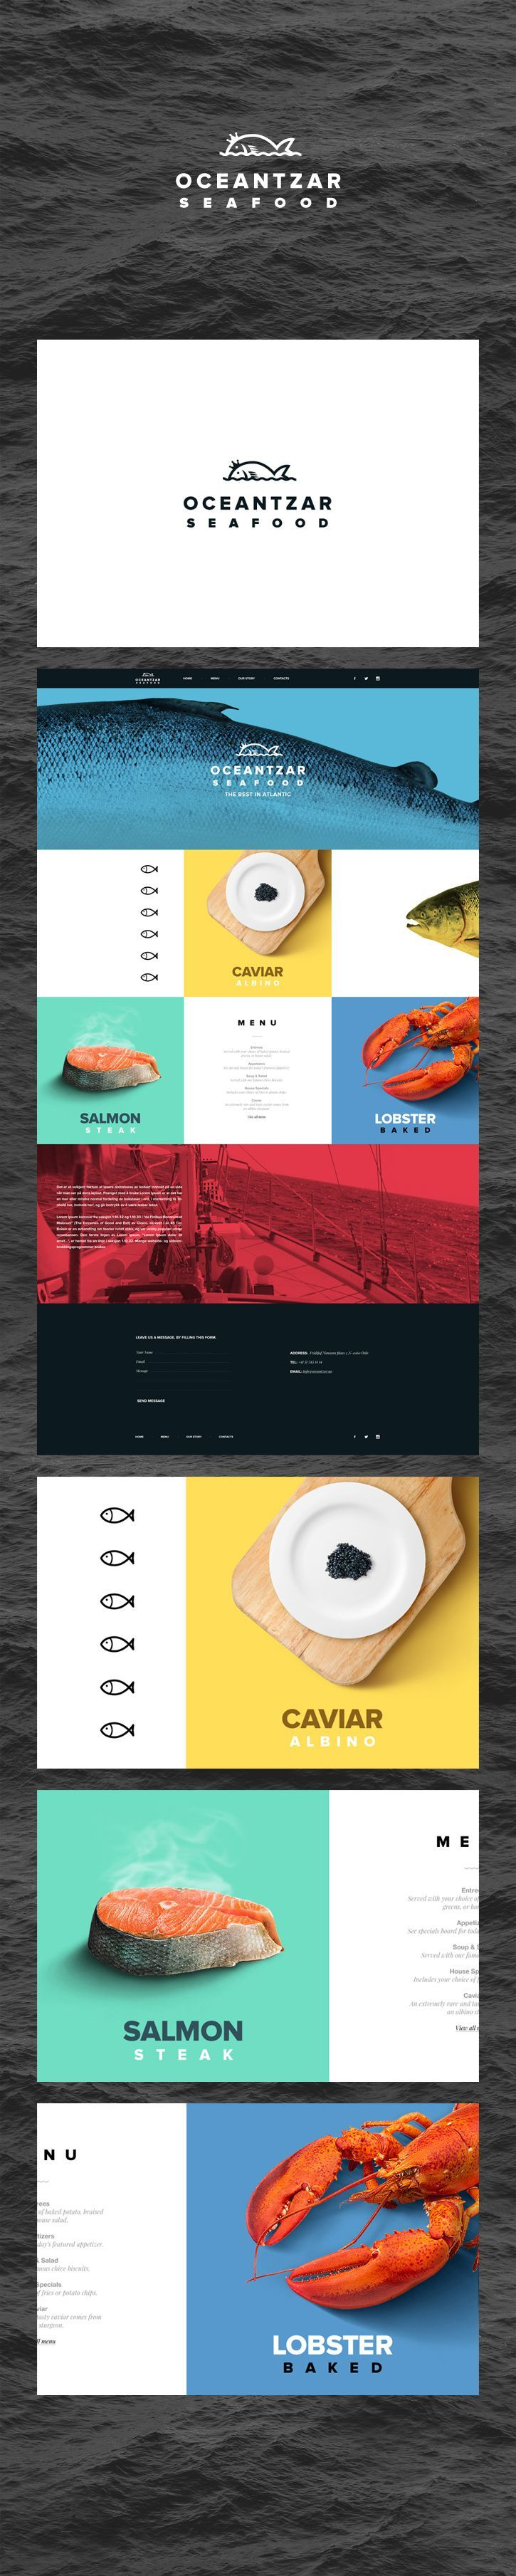 Fun web layout